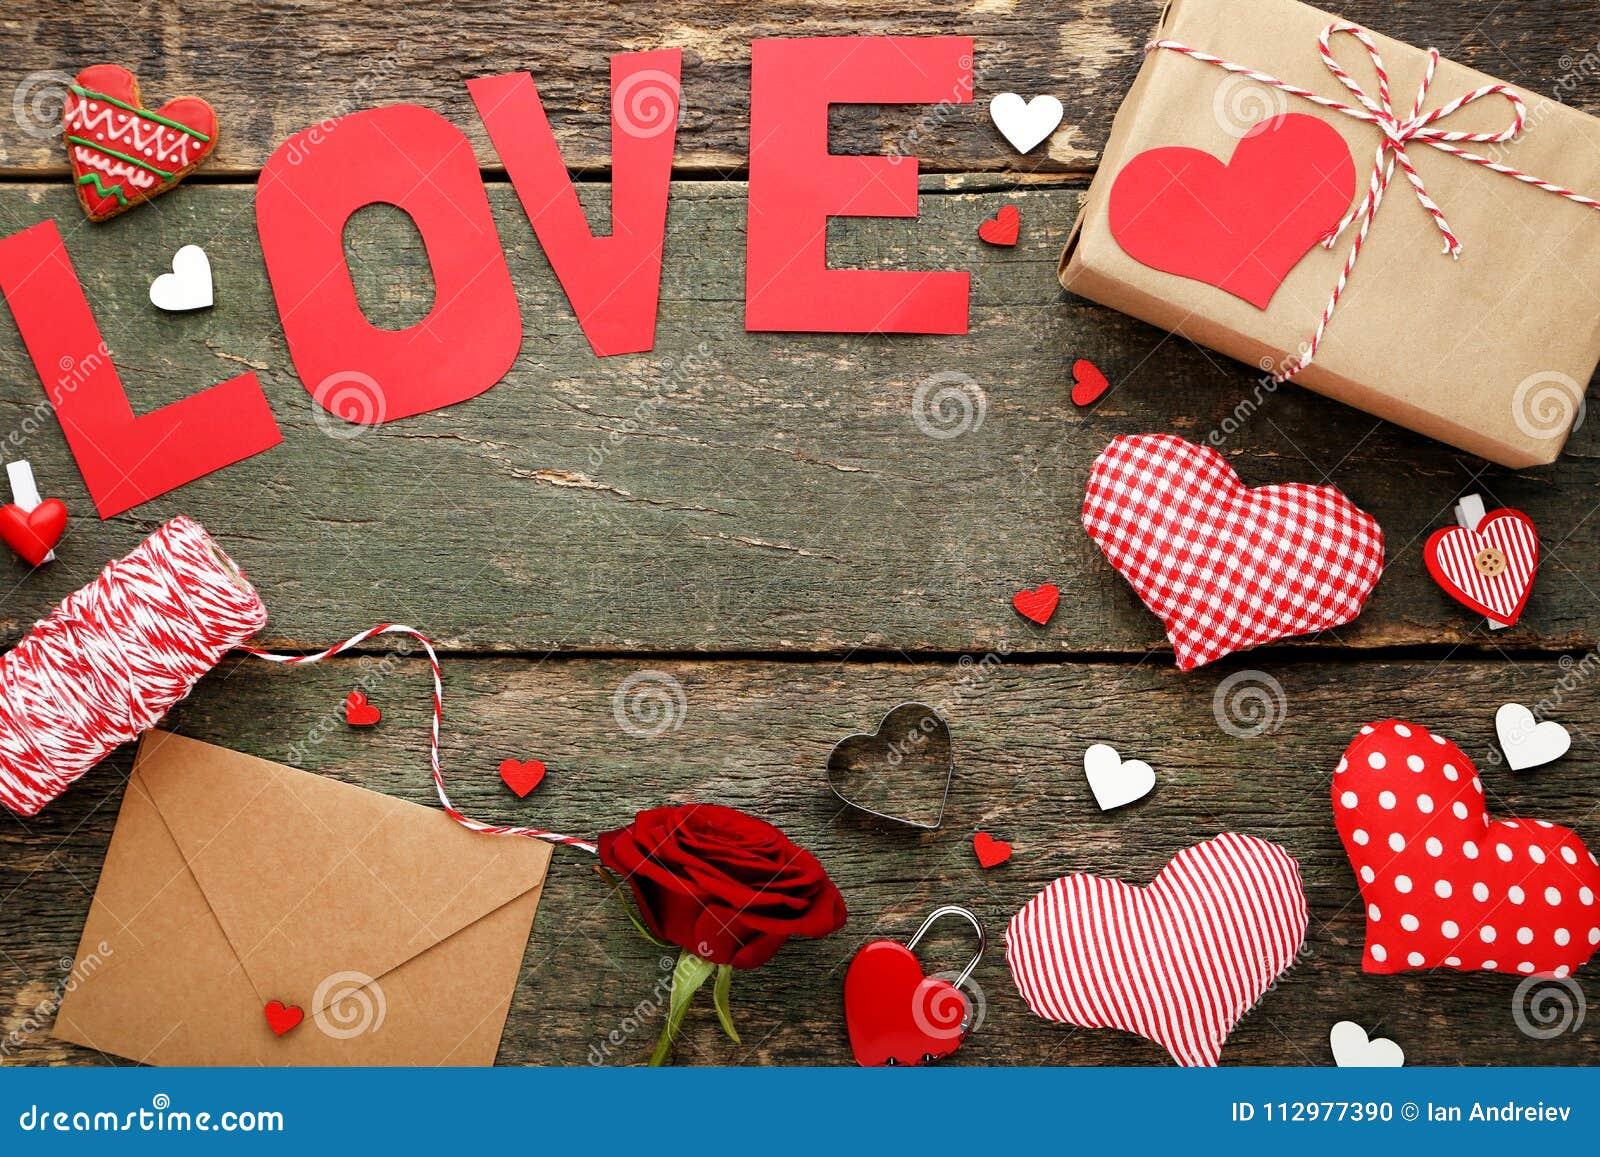 Inscription Love with rose, envelope